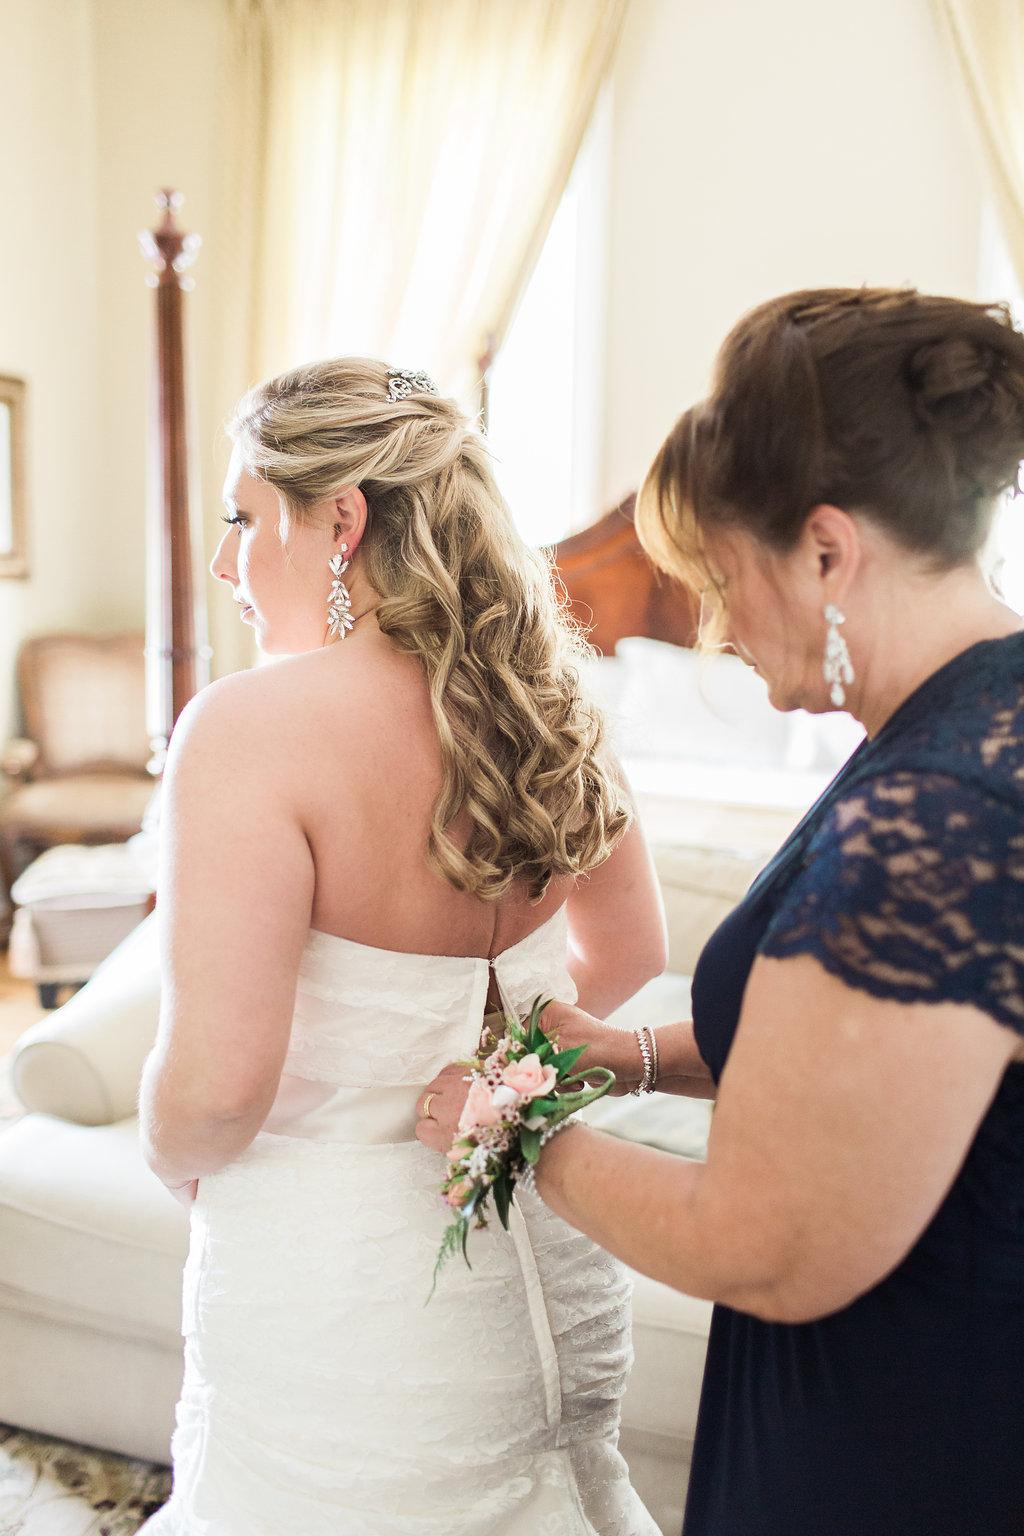 kristin-and-darren-wedding-soho-south-cafe-wormsloe-apt-b-photography-savannah-wedding-planner-savannah-weddings-southern-weddings-best-savannah-wedding-planner-3.JPG